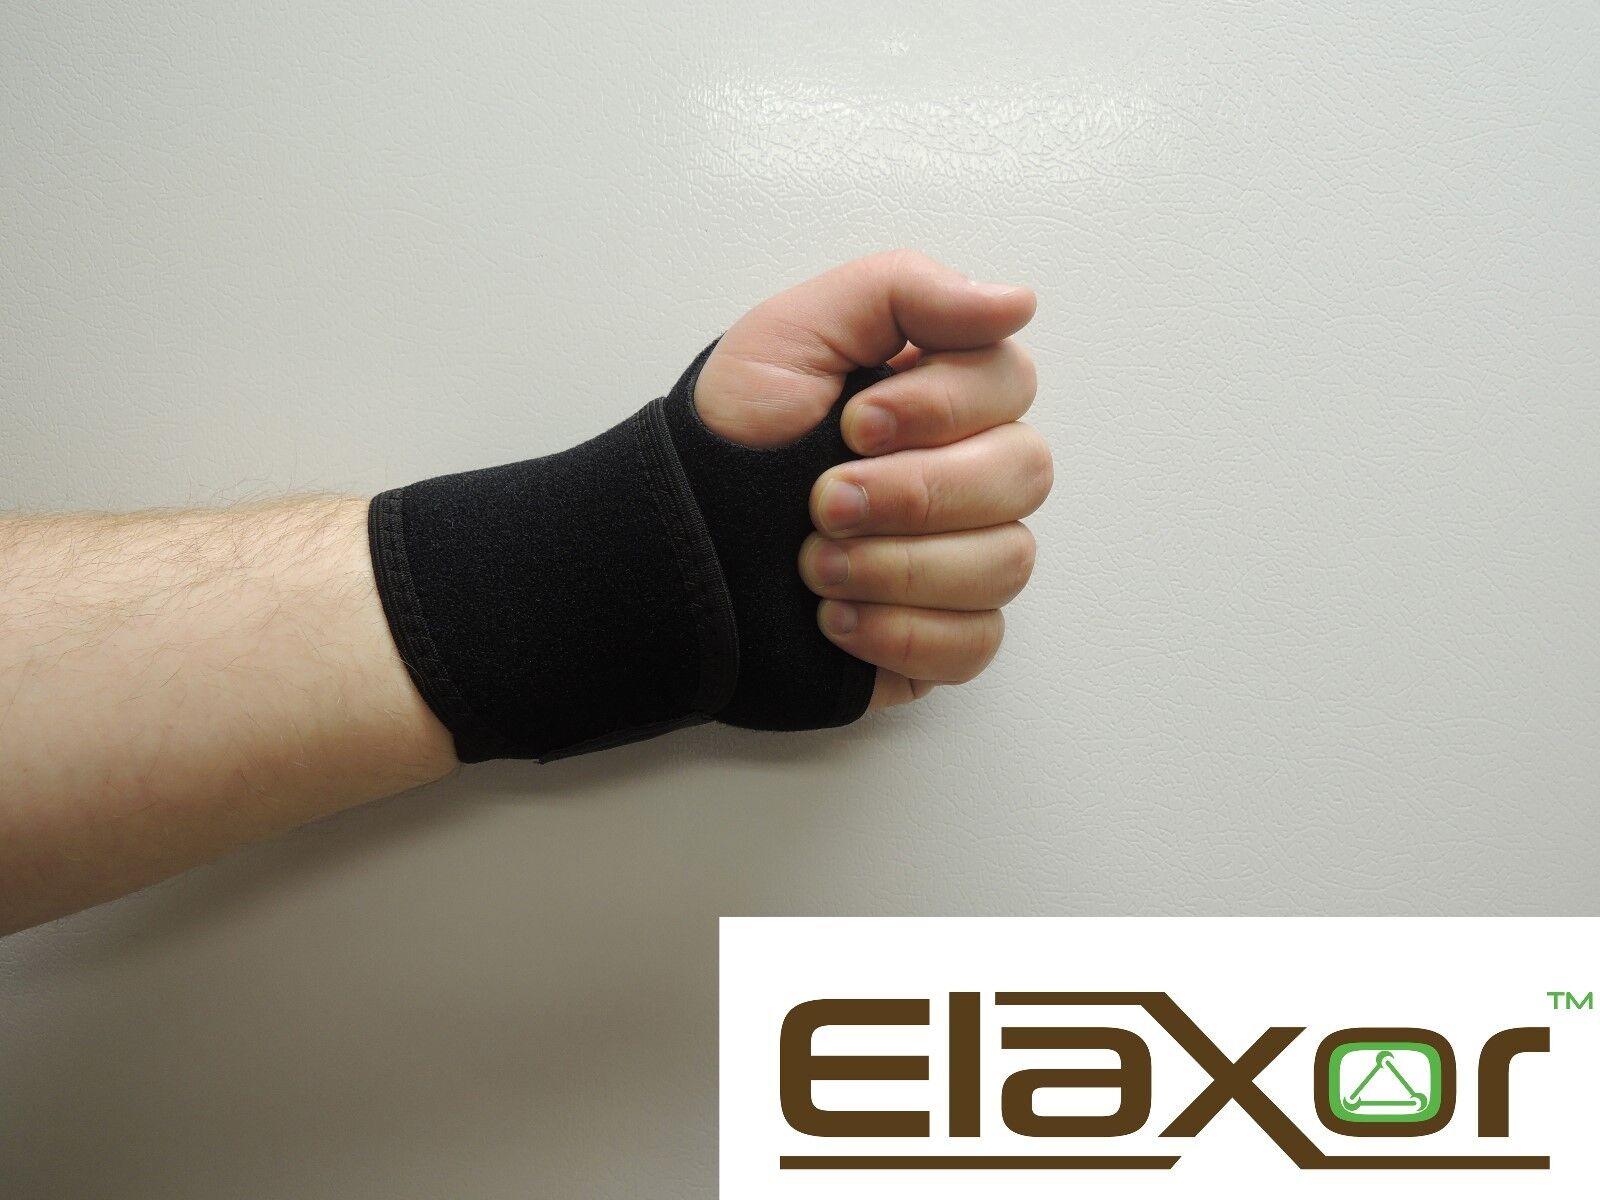 Wrist Brace Support Carpal Tunnel Splint Black Elastic Hand